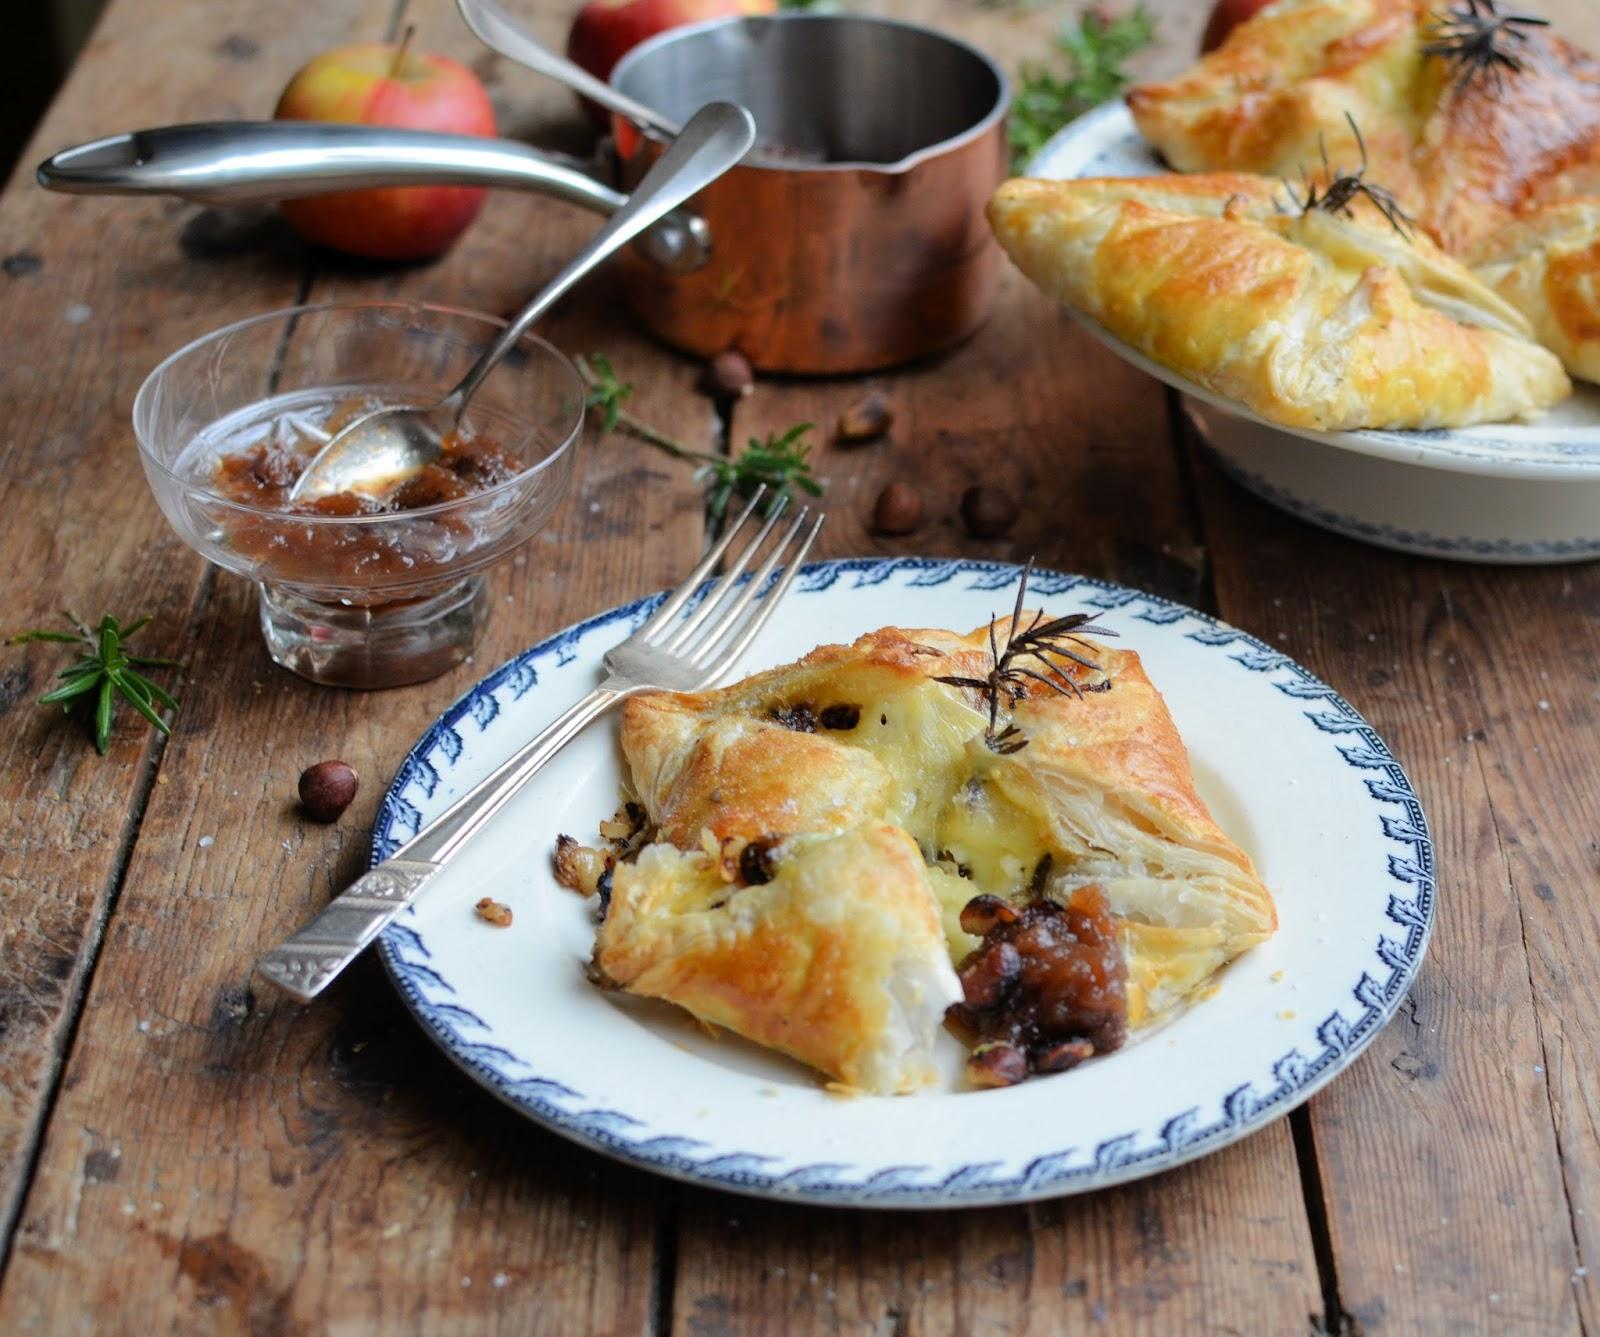 Camembert & Hazelnut Parcels with Quick Fruit Chutney